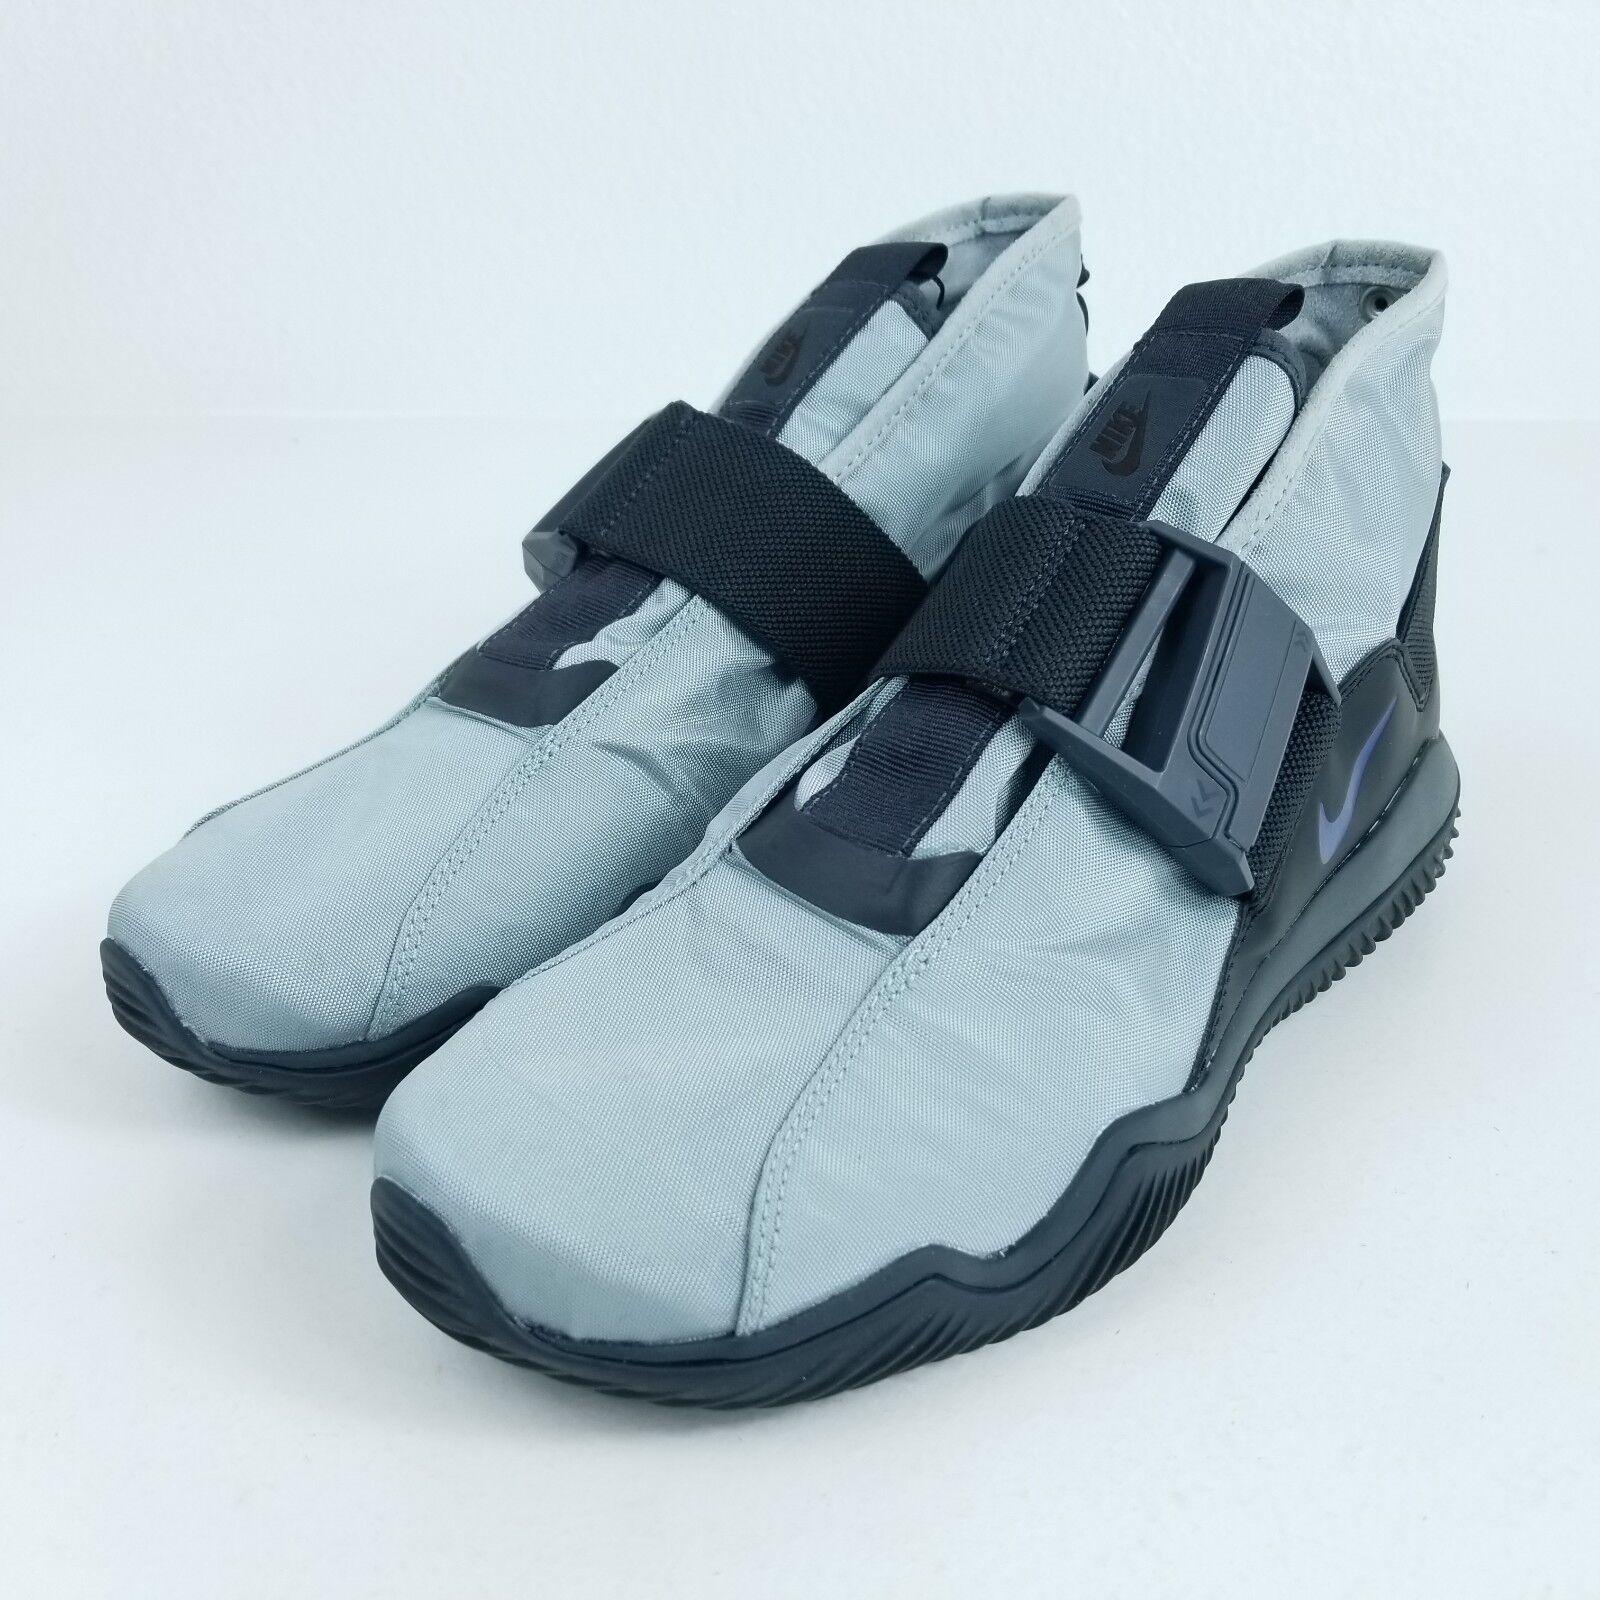 Nike komyuter Uomo sz 9 scarpe luce pomice 002 gray thunder blue aa2211 002 pomice 196581